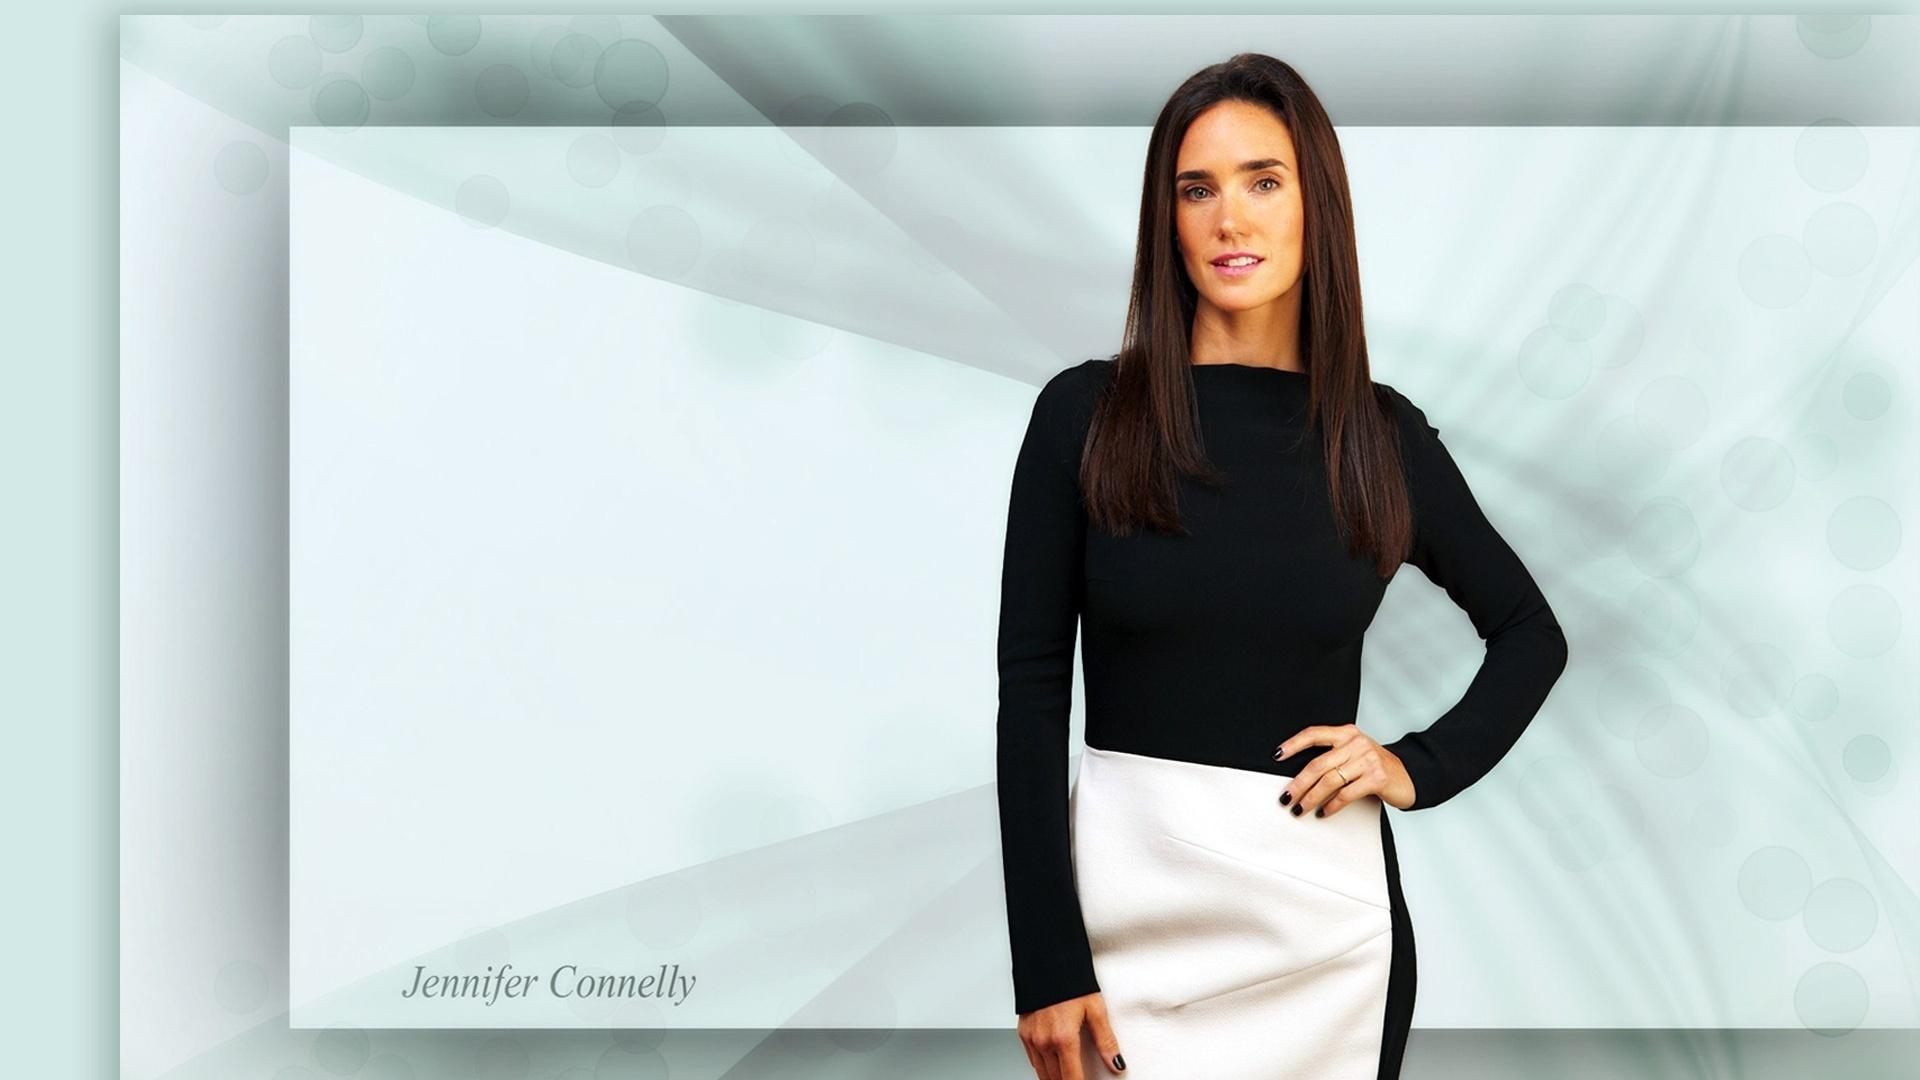 Jennifer Connelly Hd Background